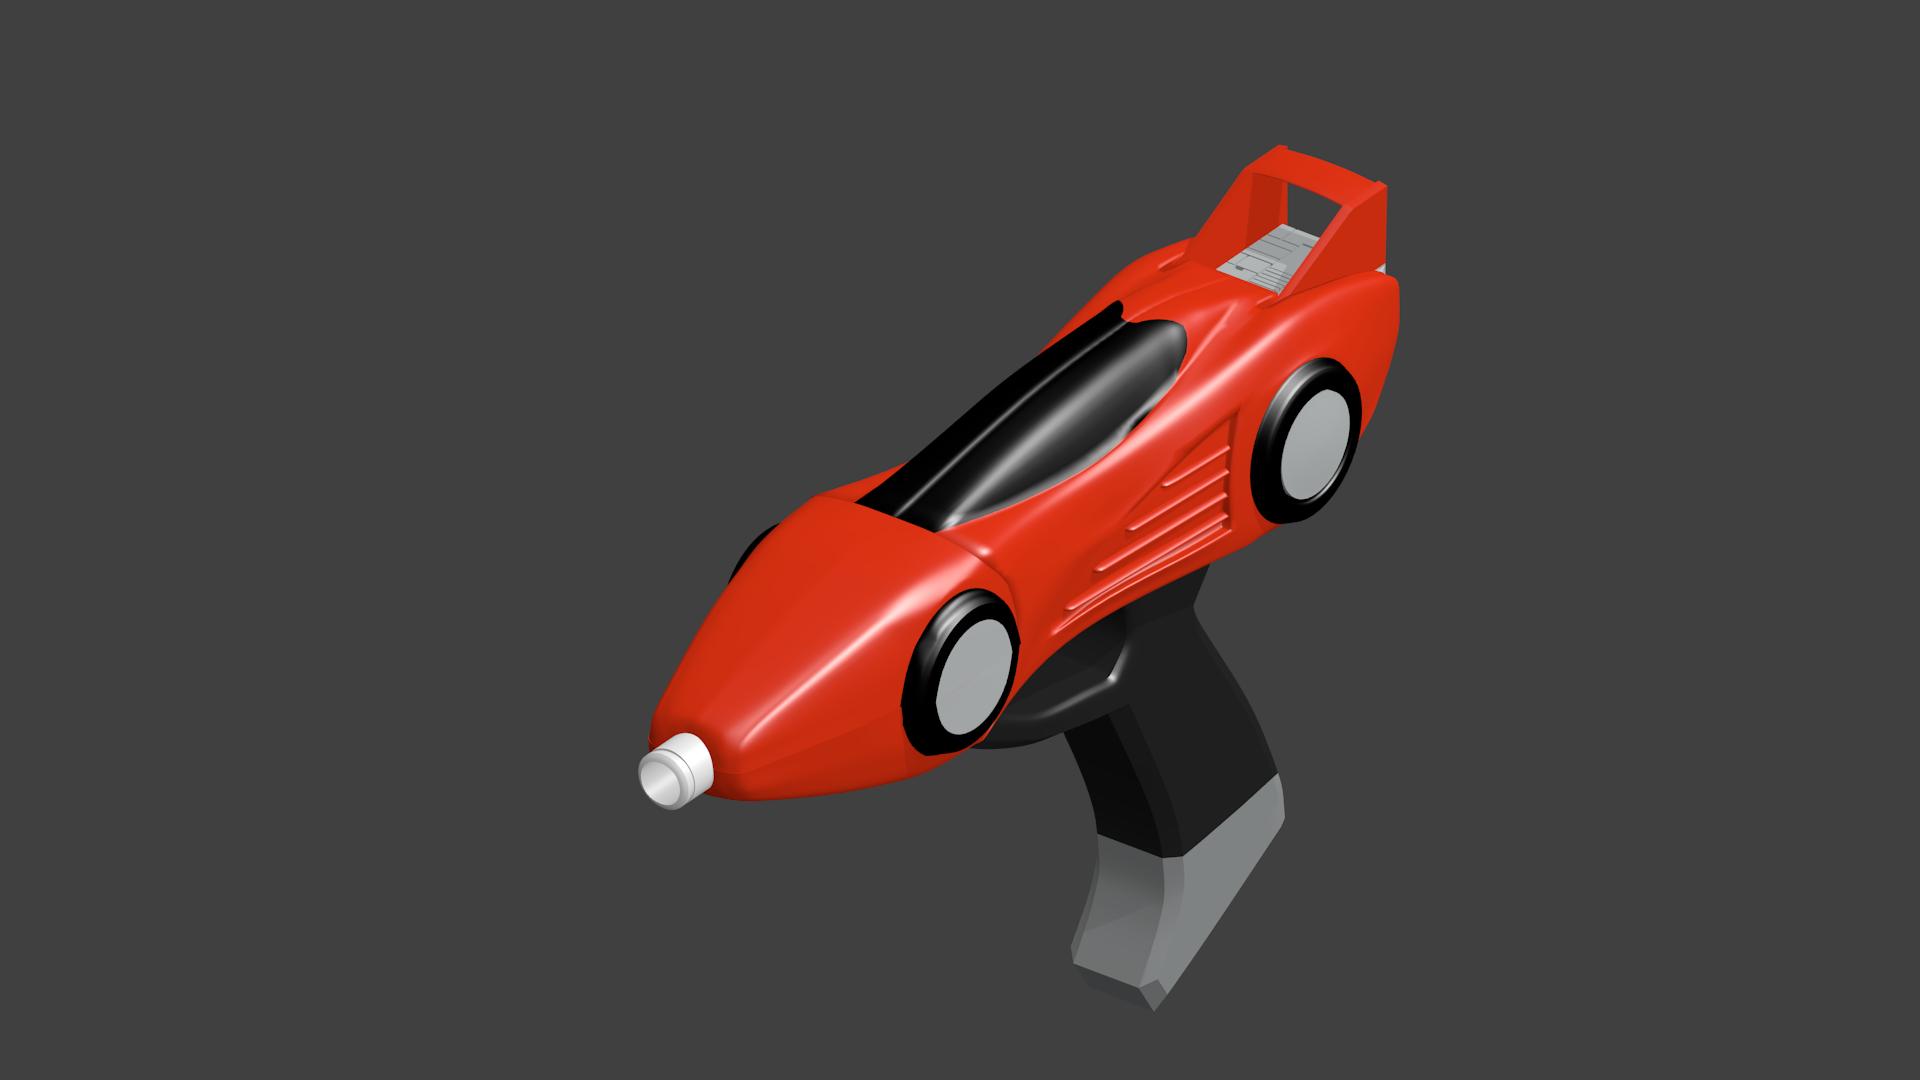 Auto Blaster Top Angle.png